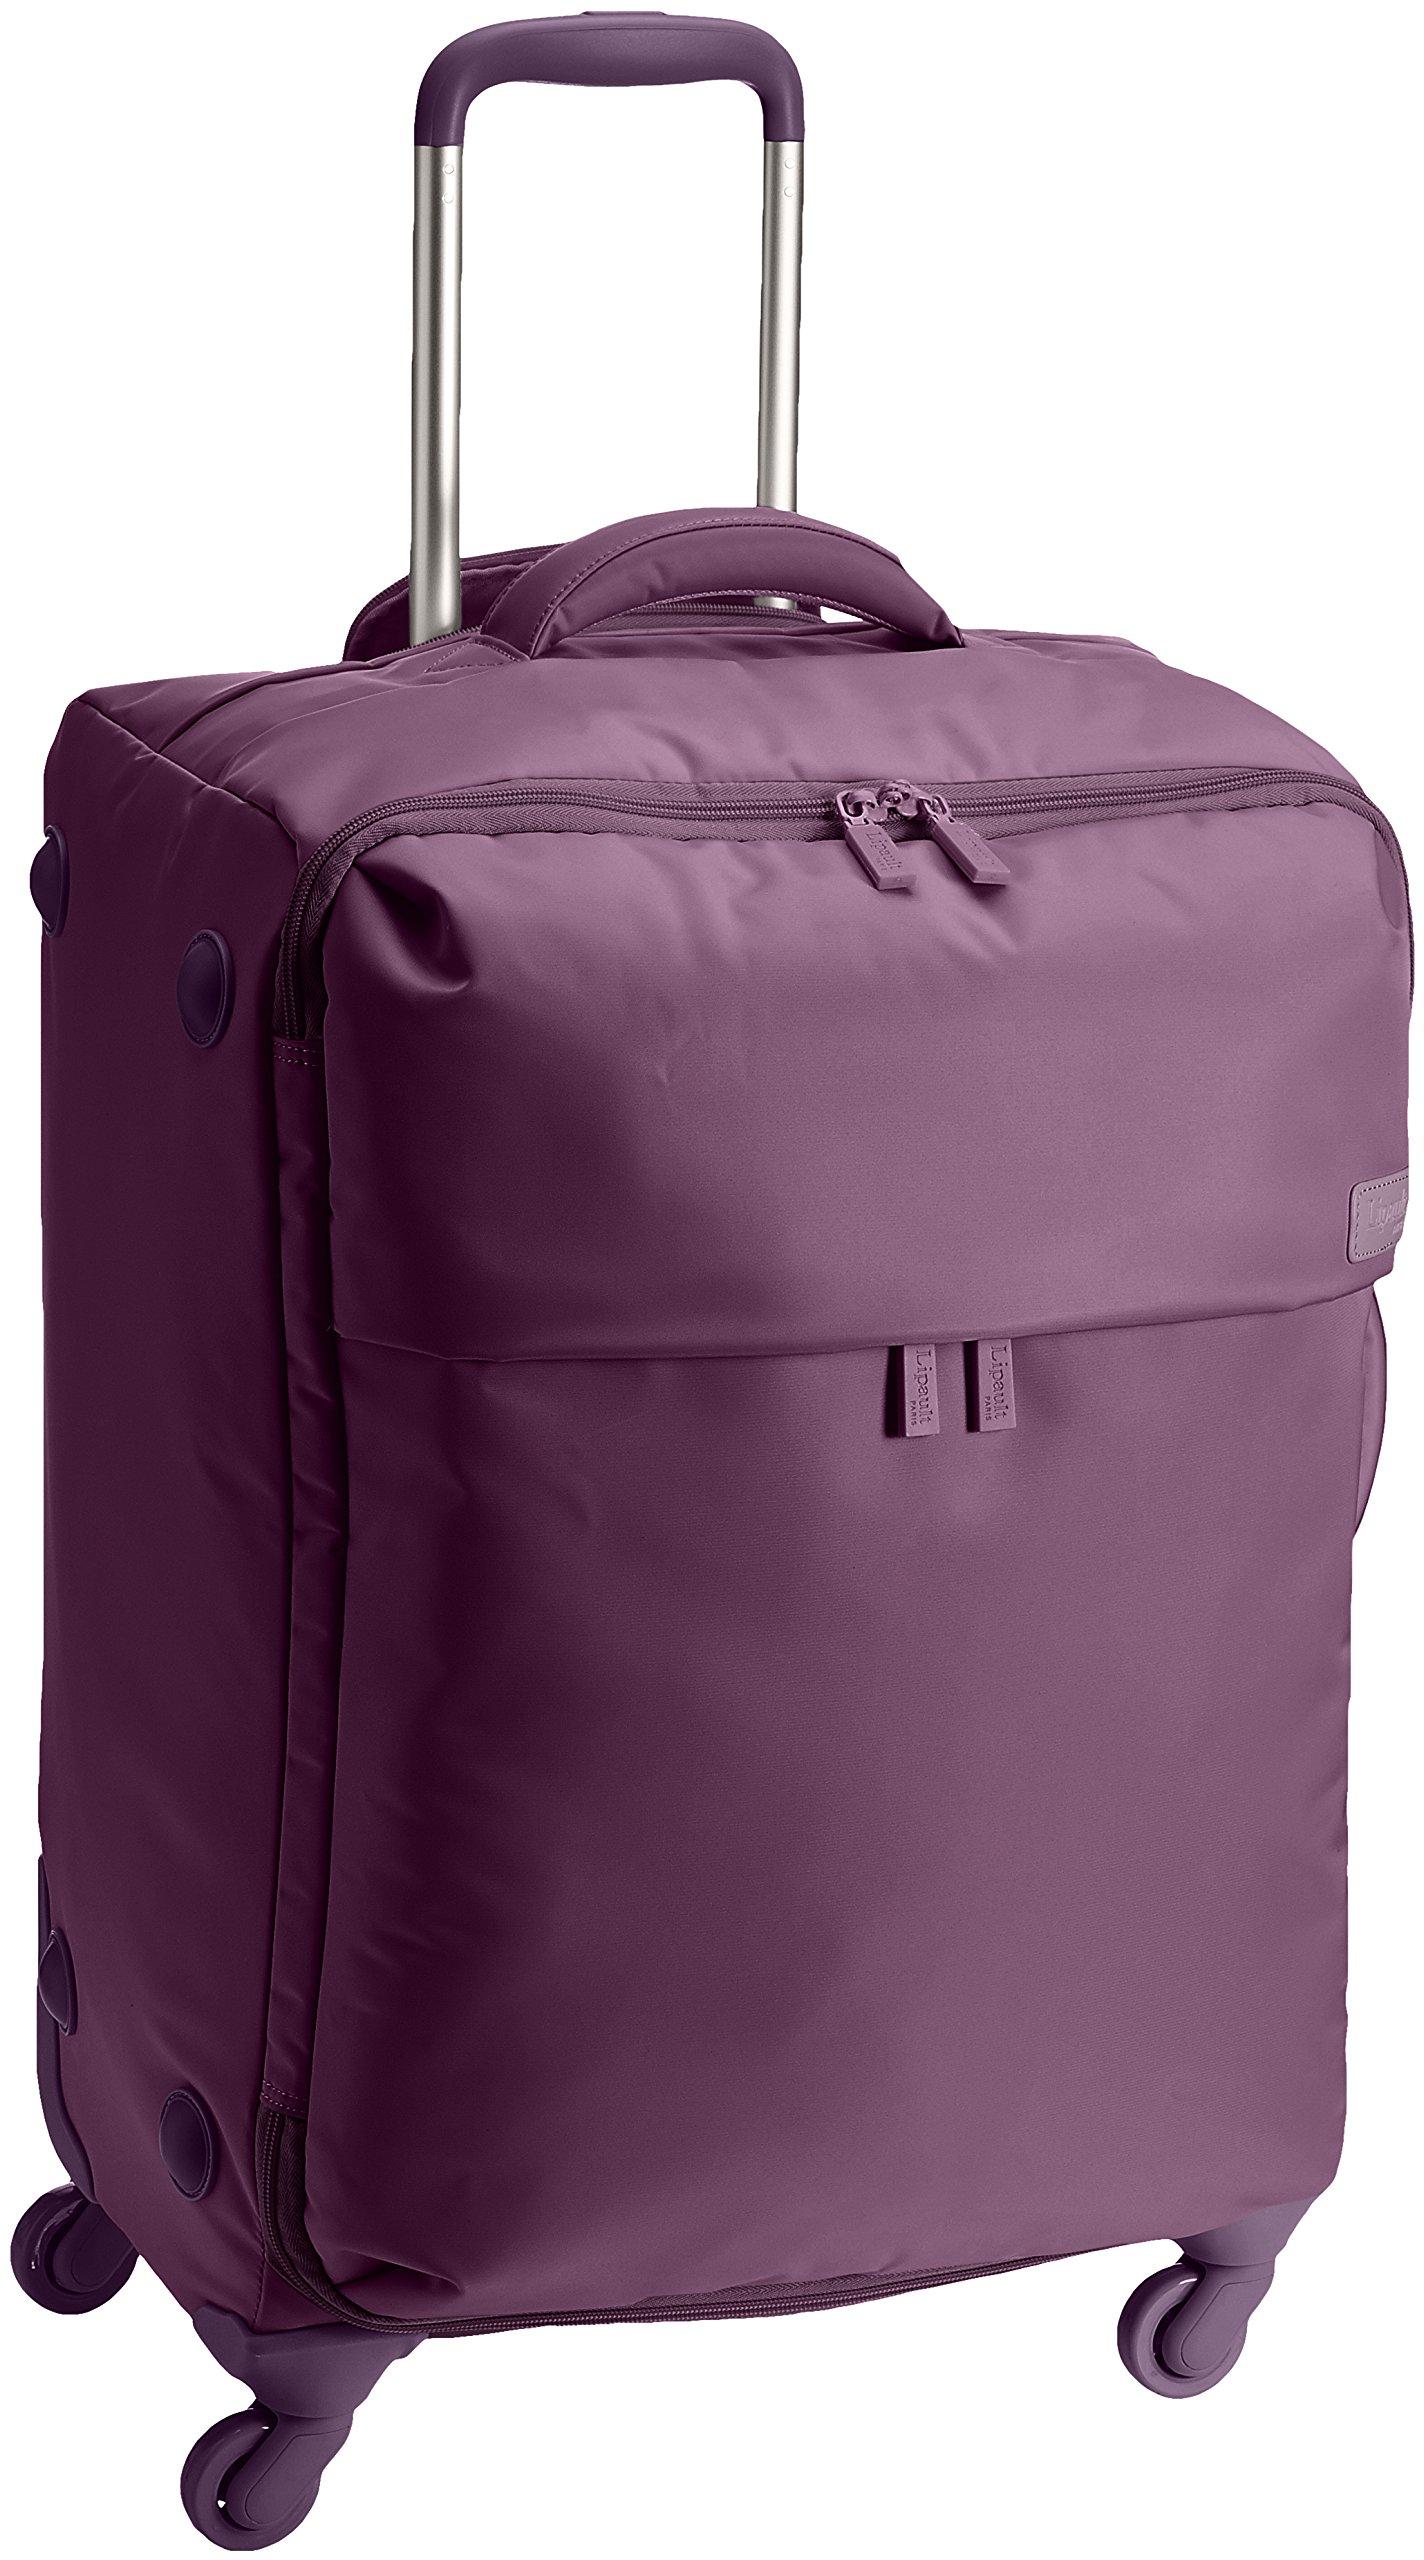 Lipault Luggage Original Plume 20'' Spinner Suitcase,Purple,One Size